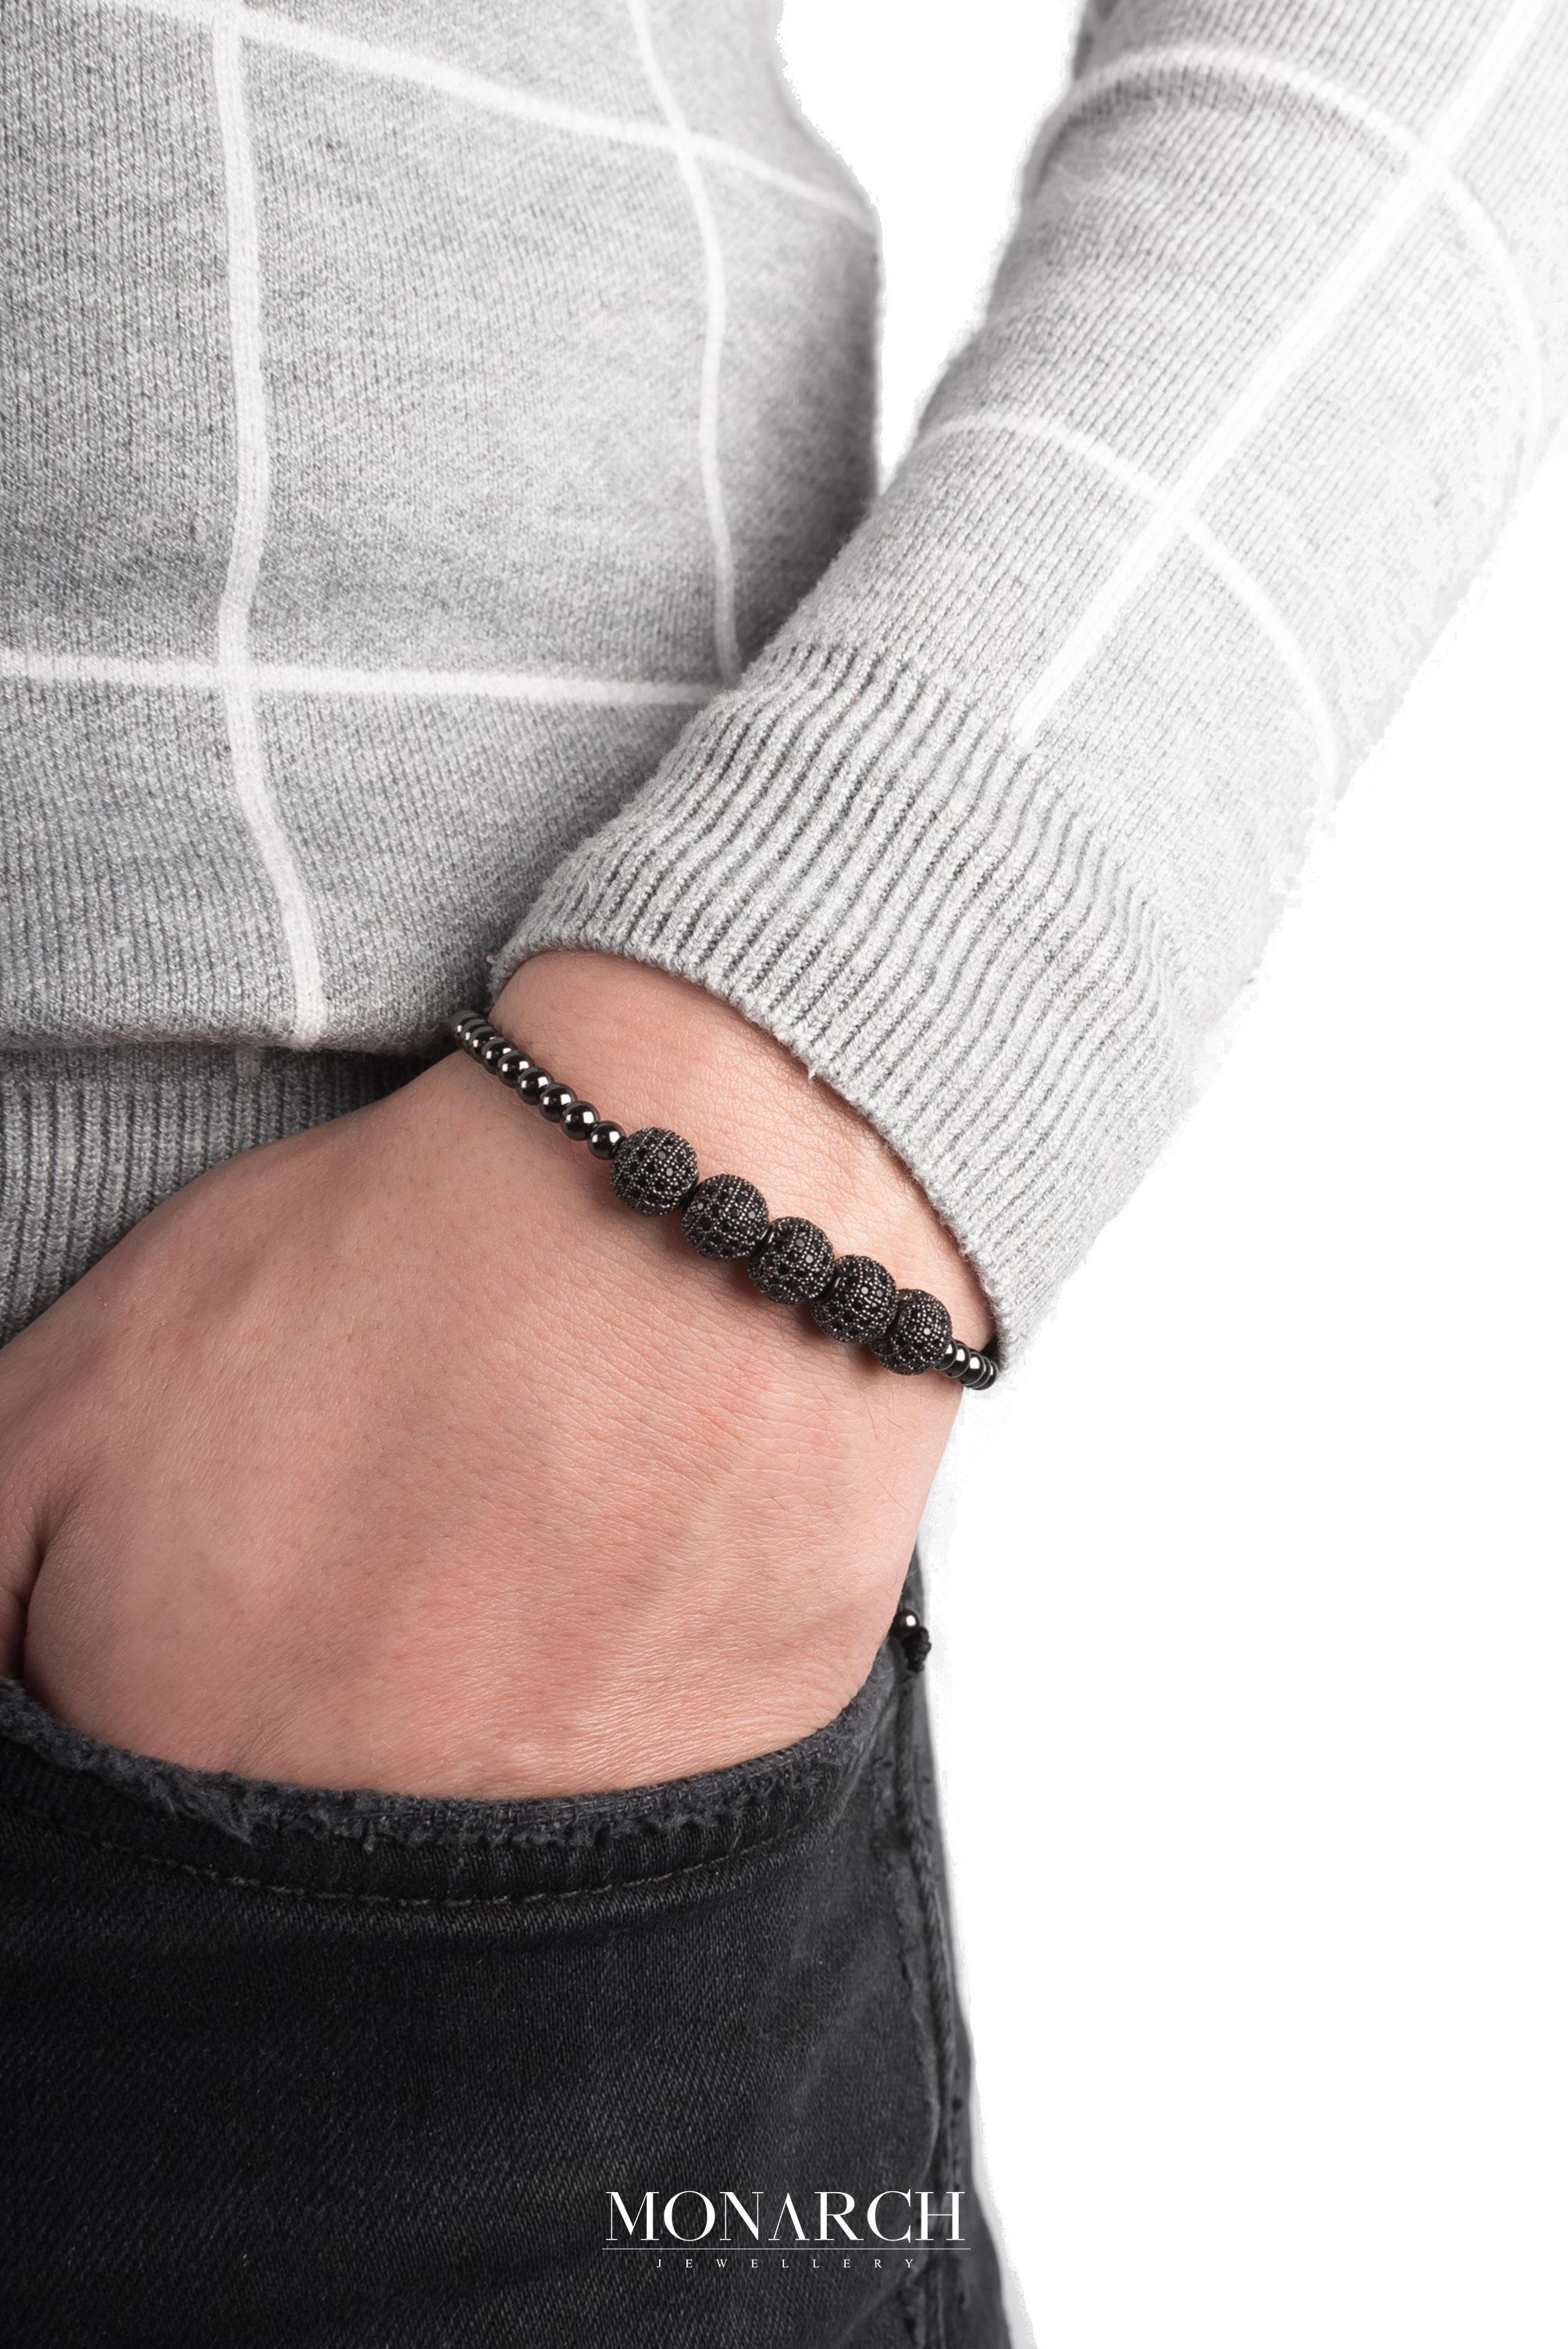 black luxury bracelet for man, monarch jewellery MA72BZBD